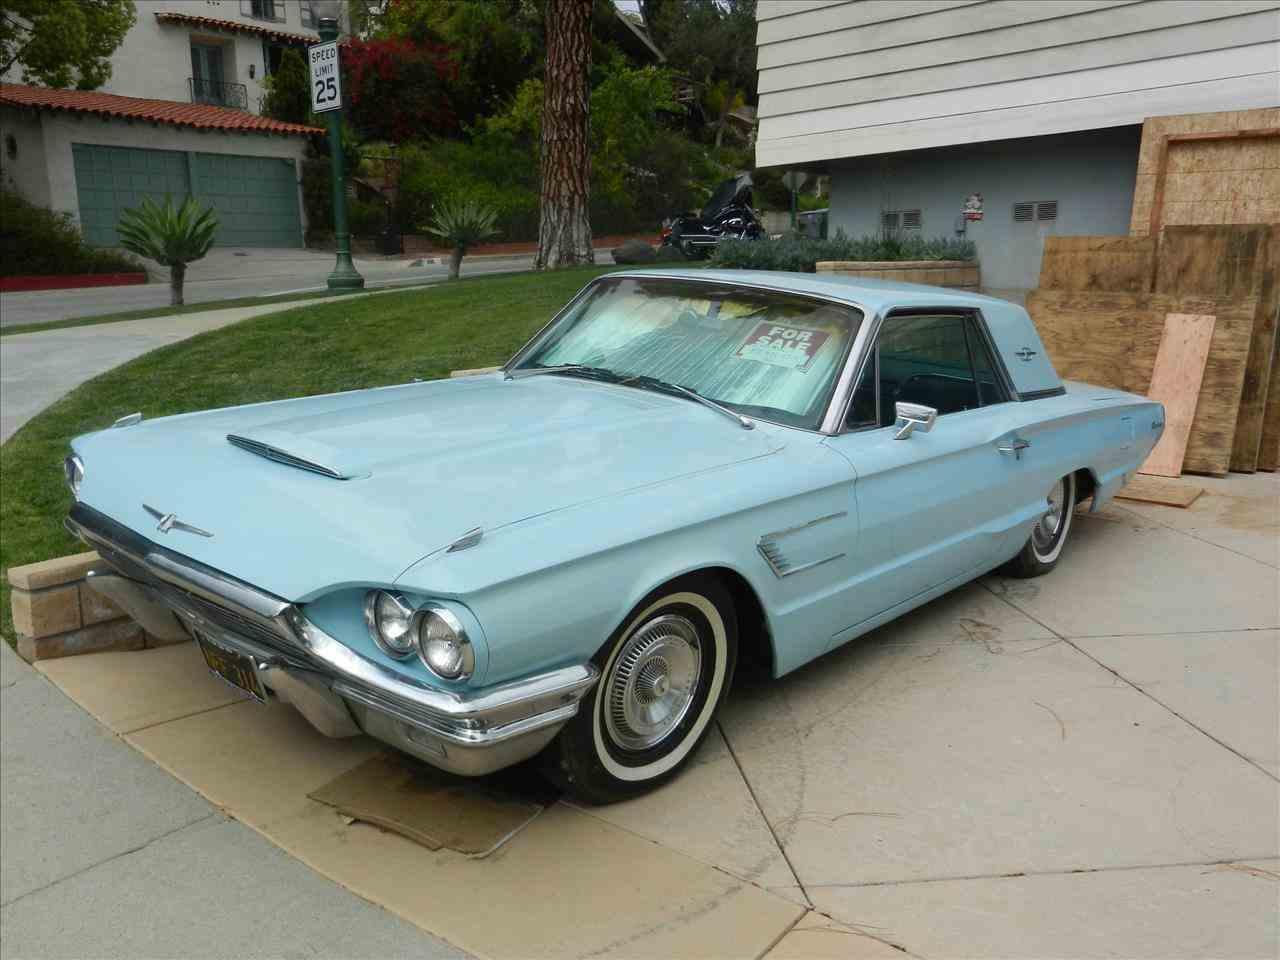 1965 Ford Thunderbird for Sale | ClassicCars.com | CC-678233